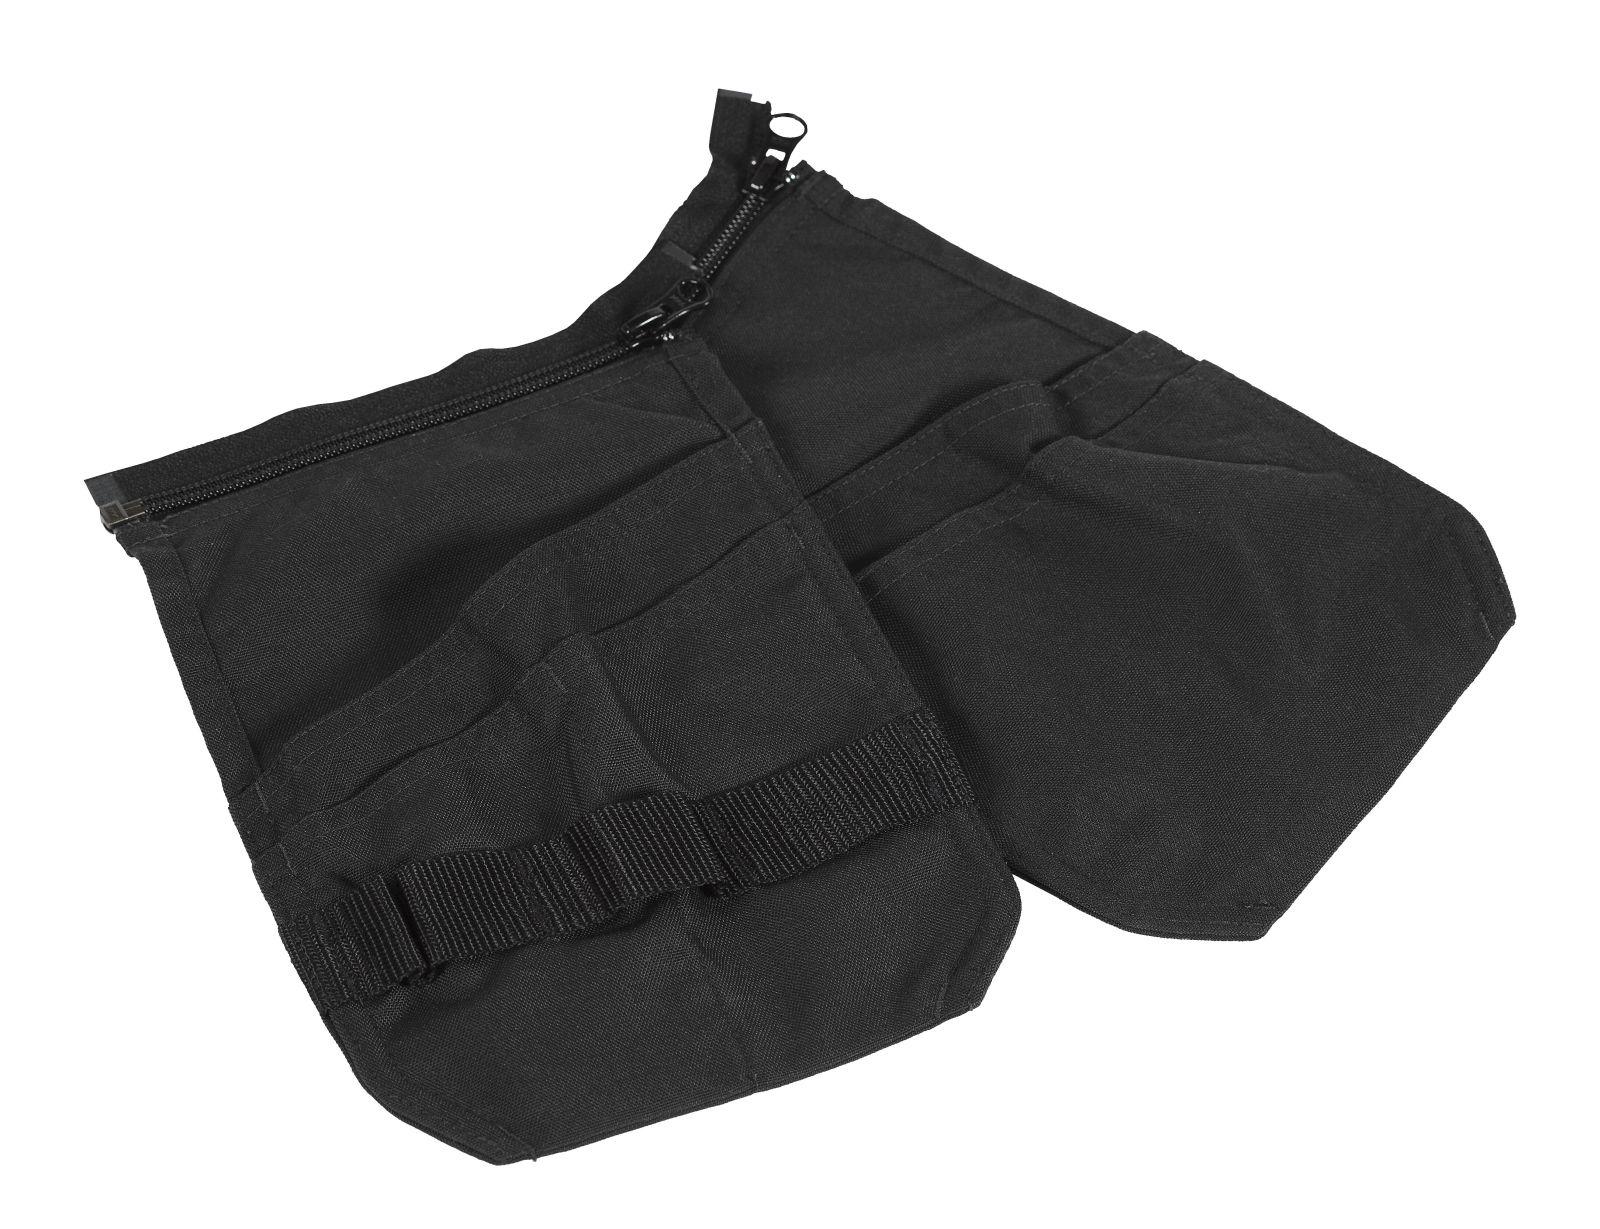 Blaklader Losse spijkerzakken 21831948 zwart(9900)